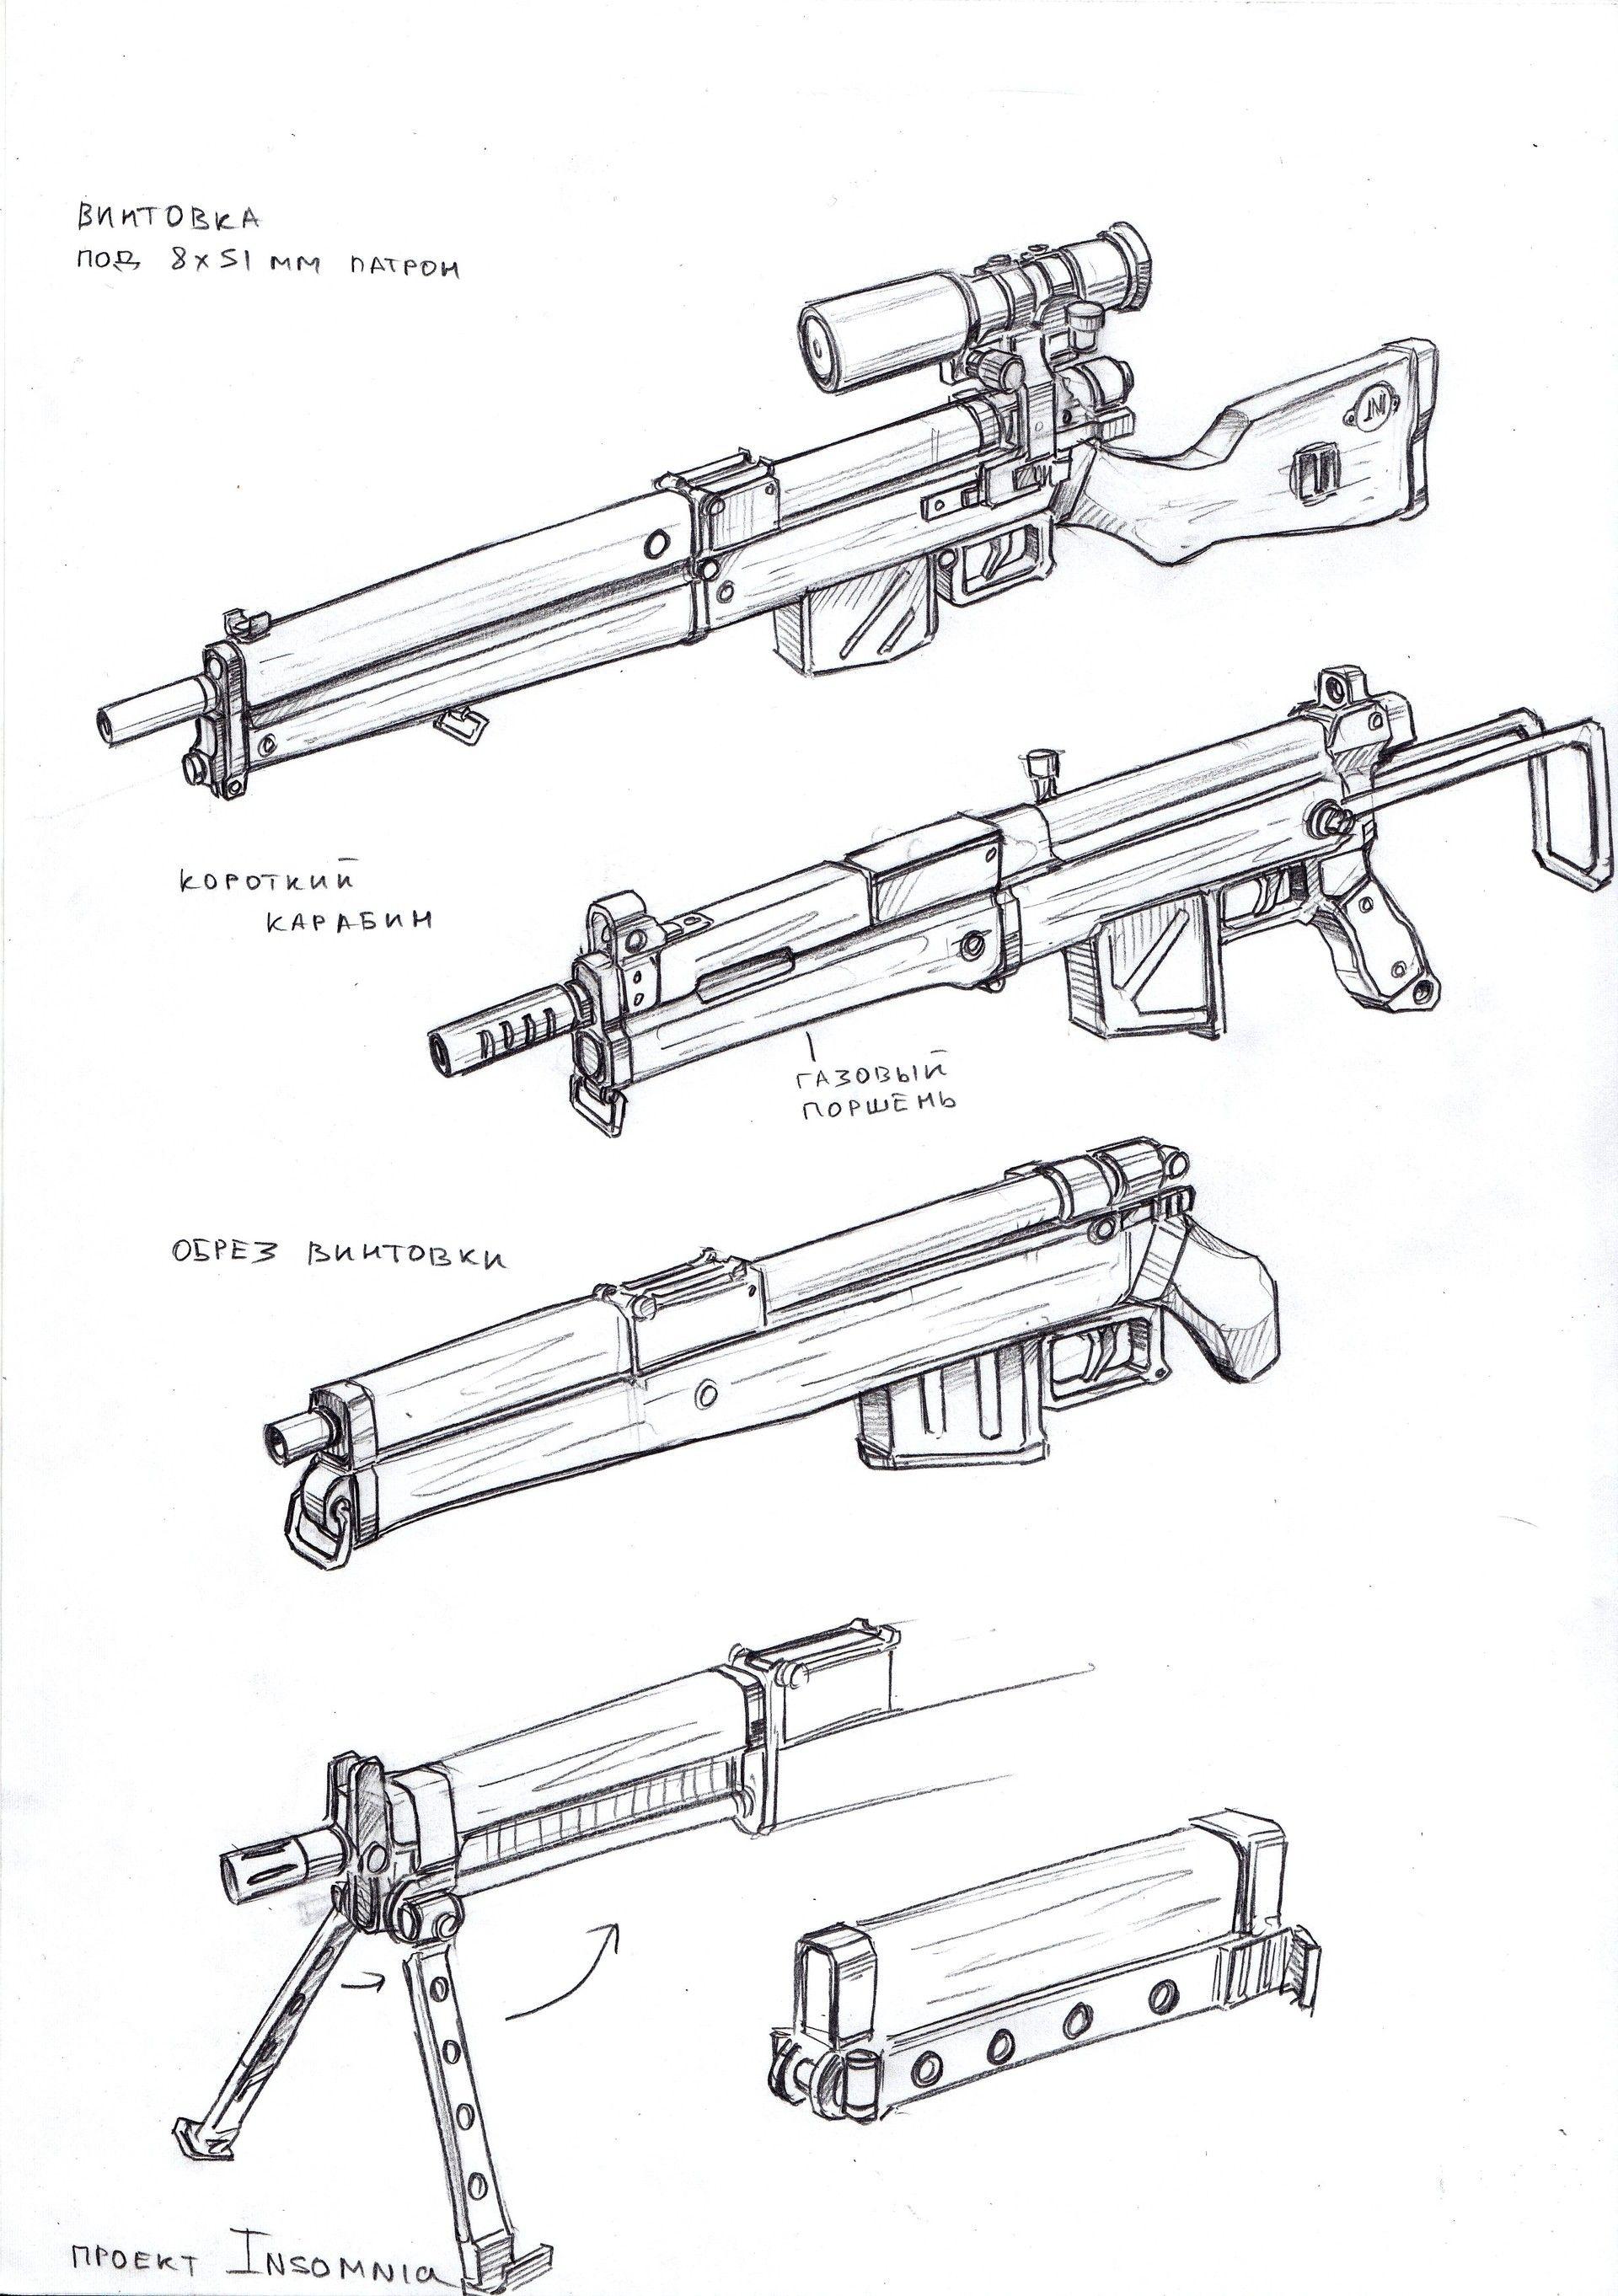 Pin By Shadowcard On Gunsmith